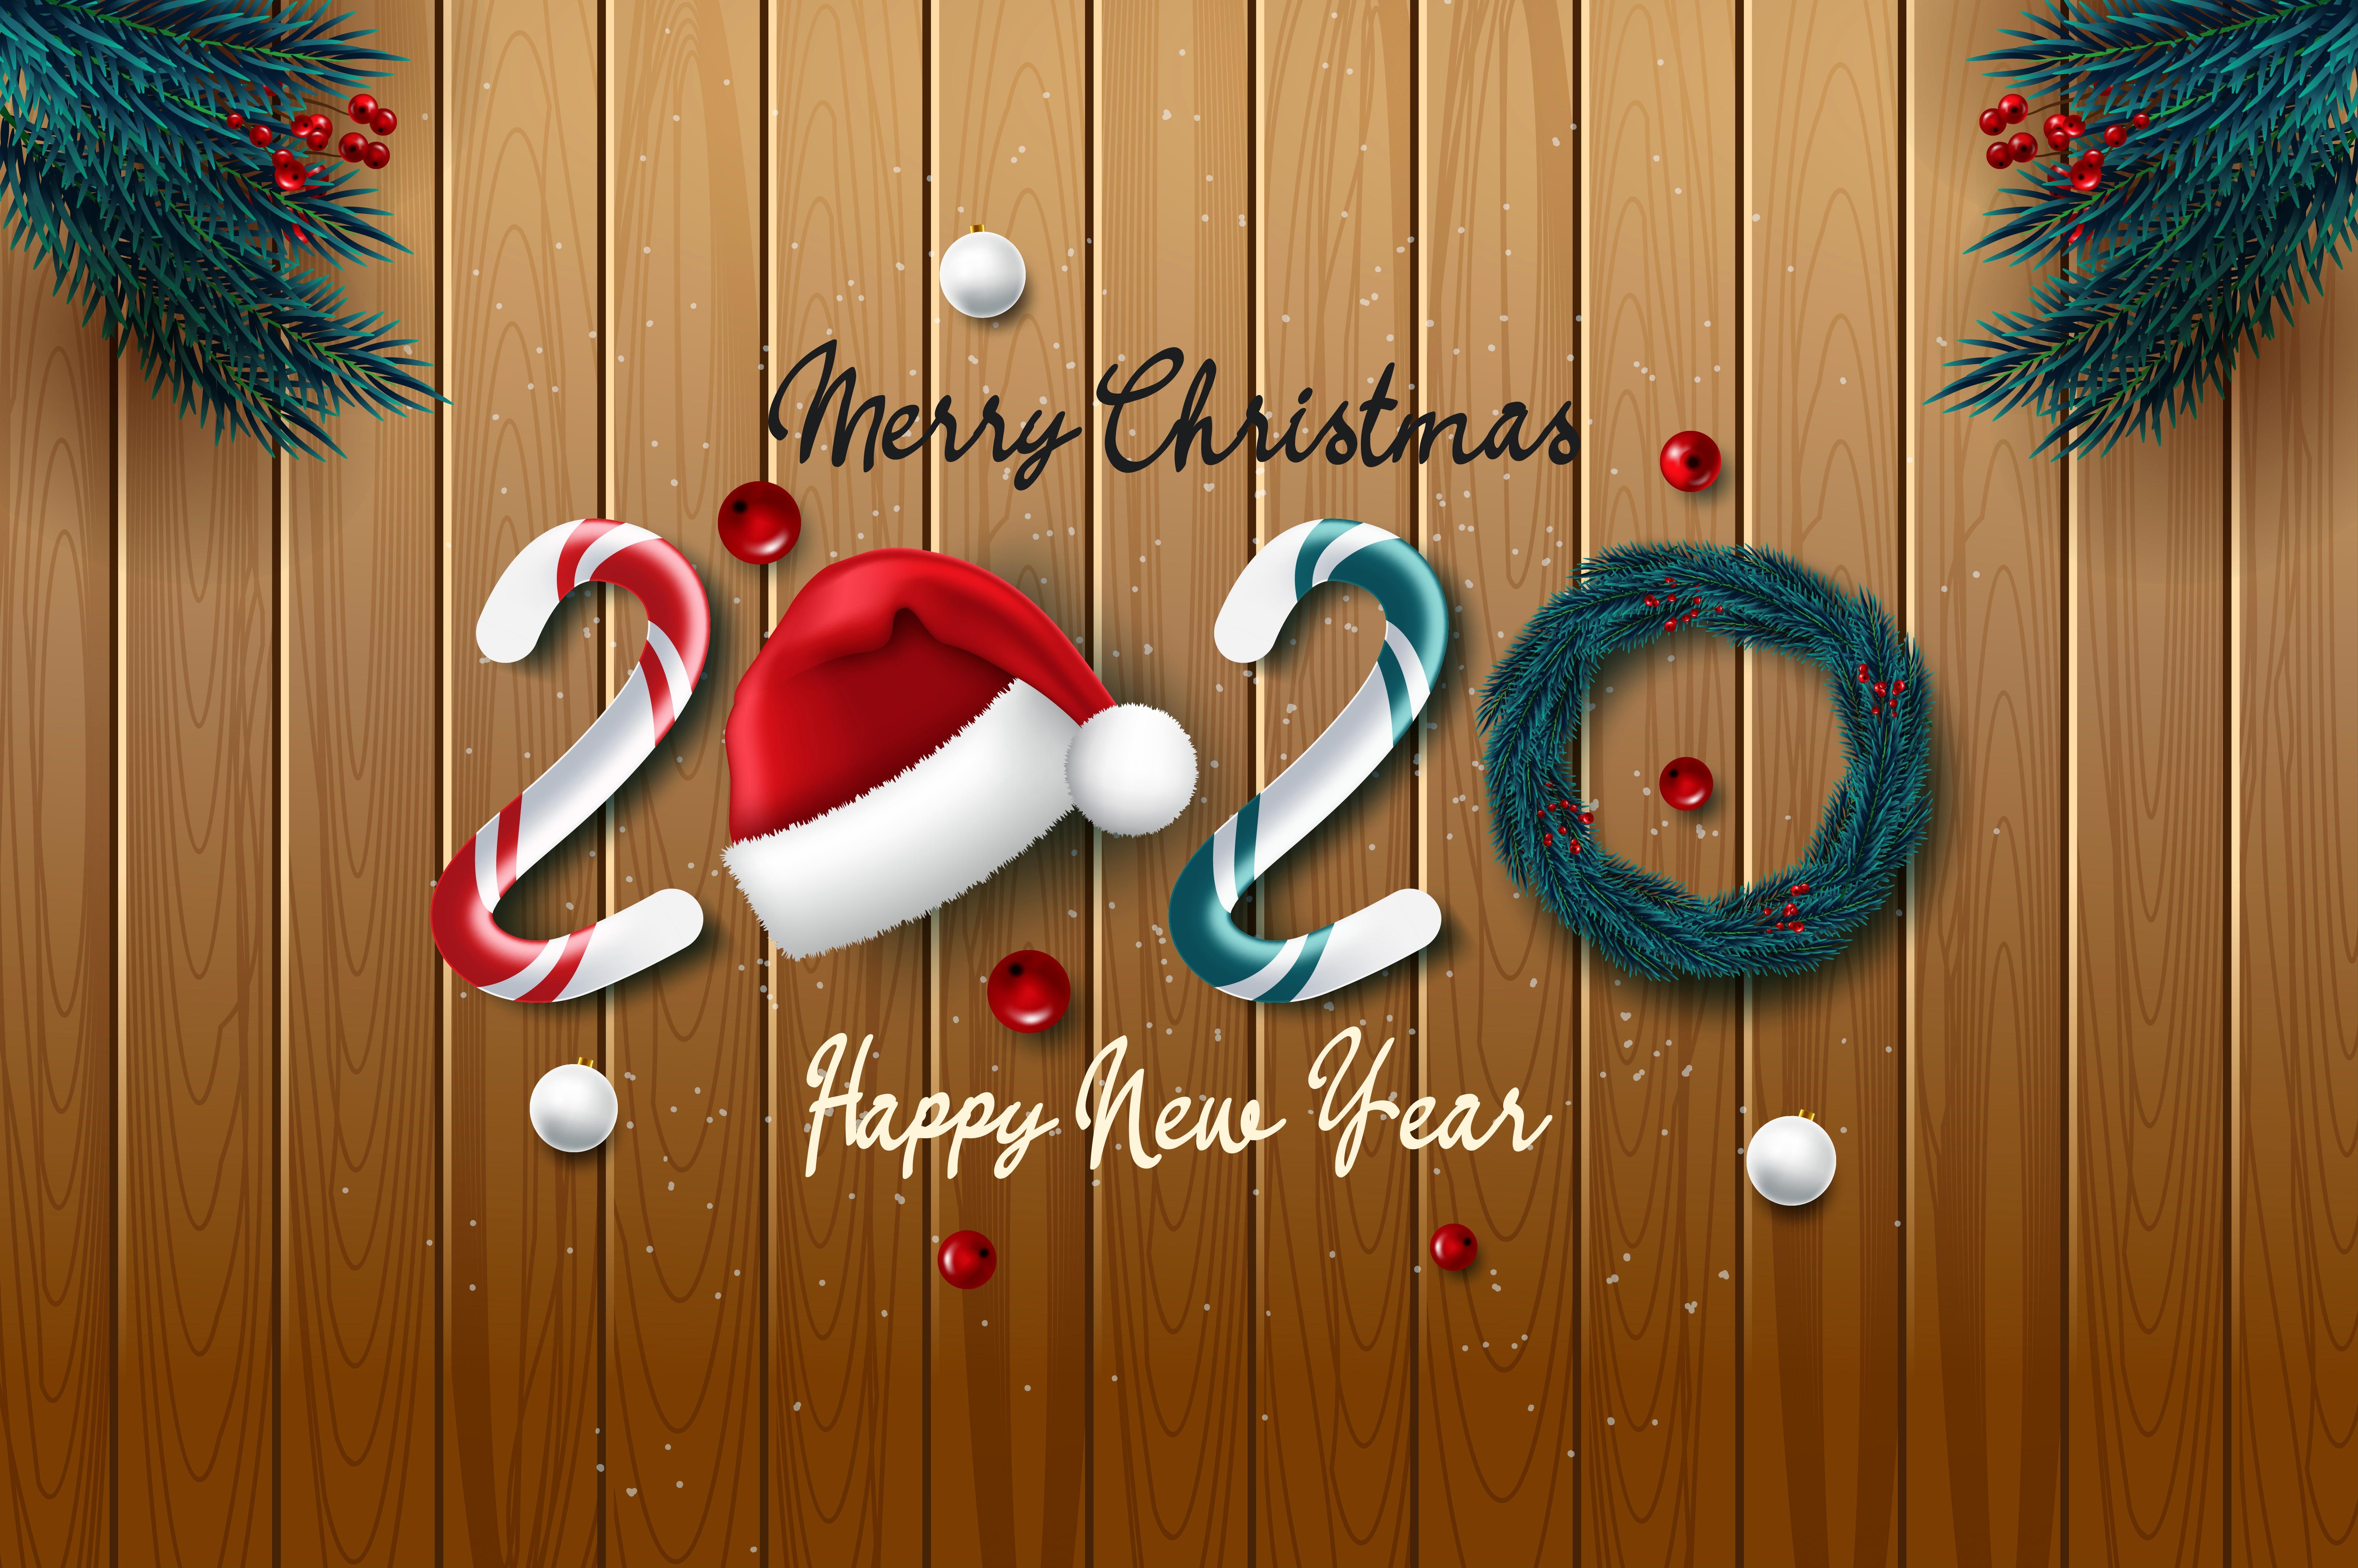 New Year 2020 5k Retina Ultra HD Wallpaper Background Image 6267x4167